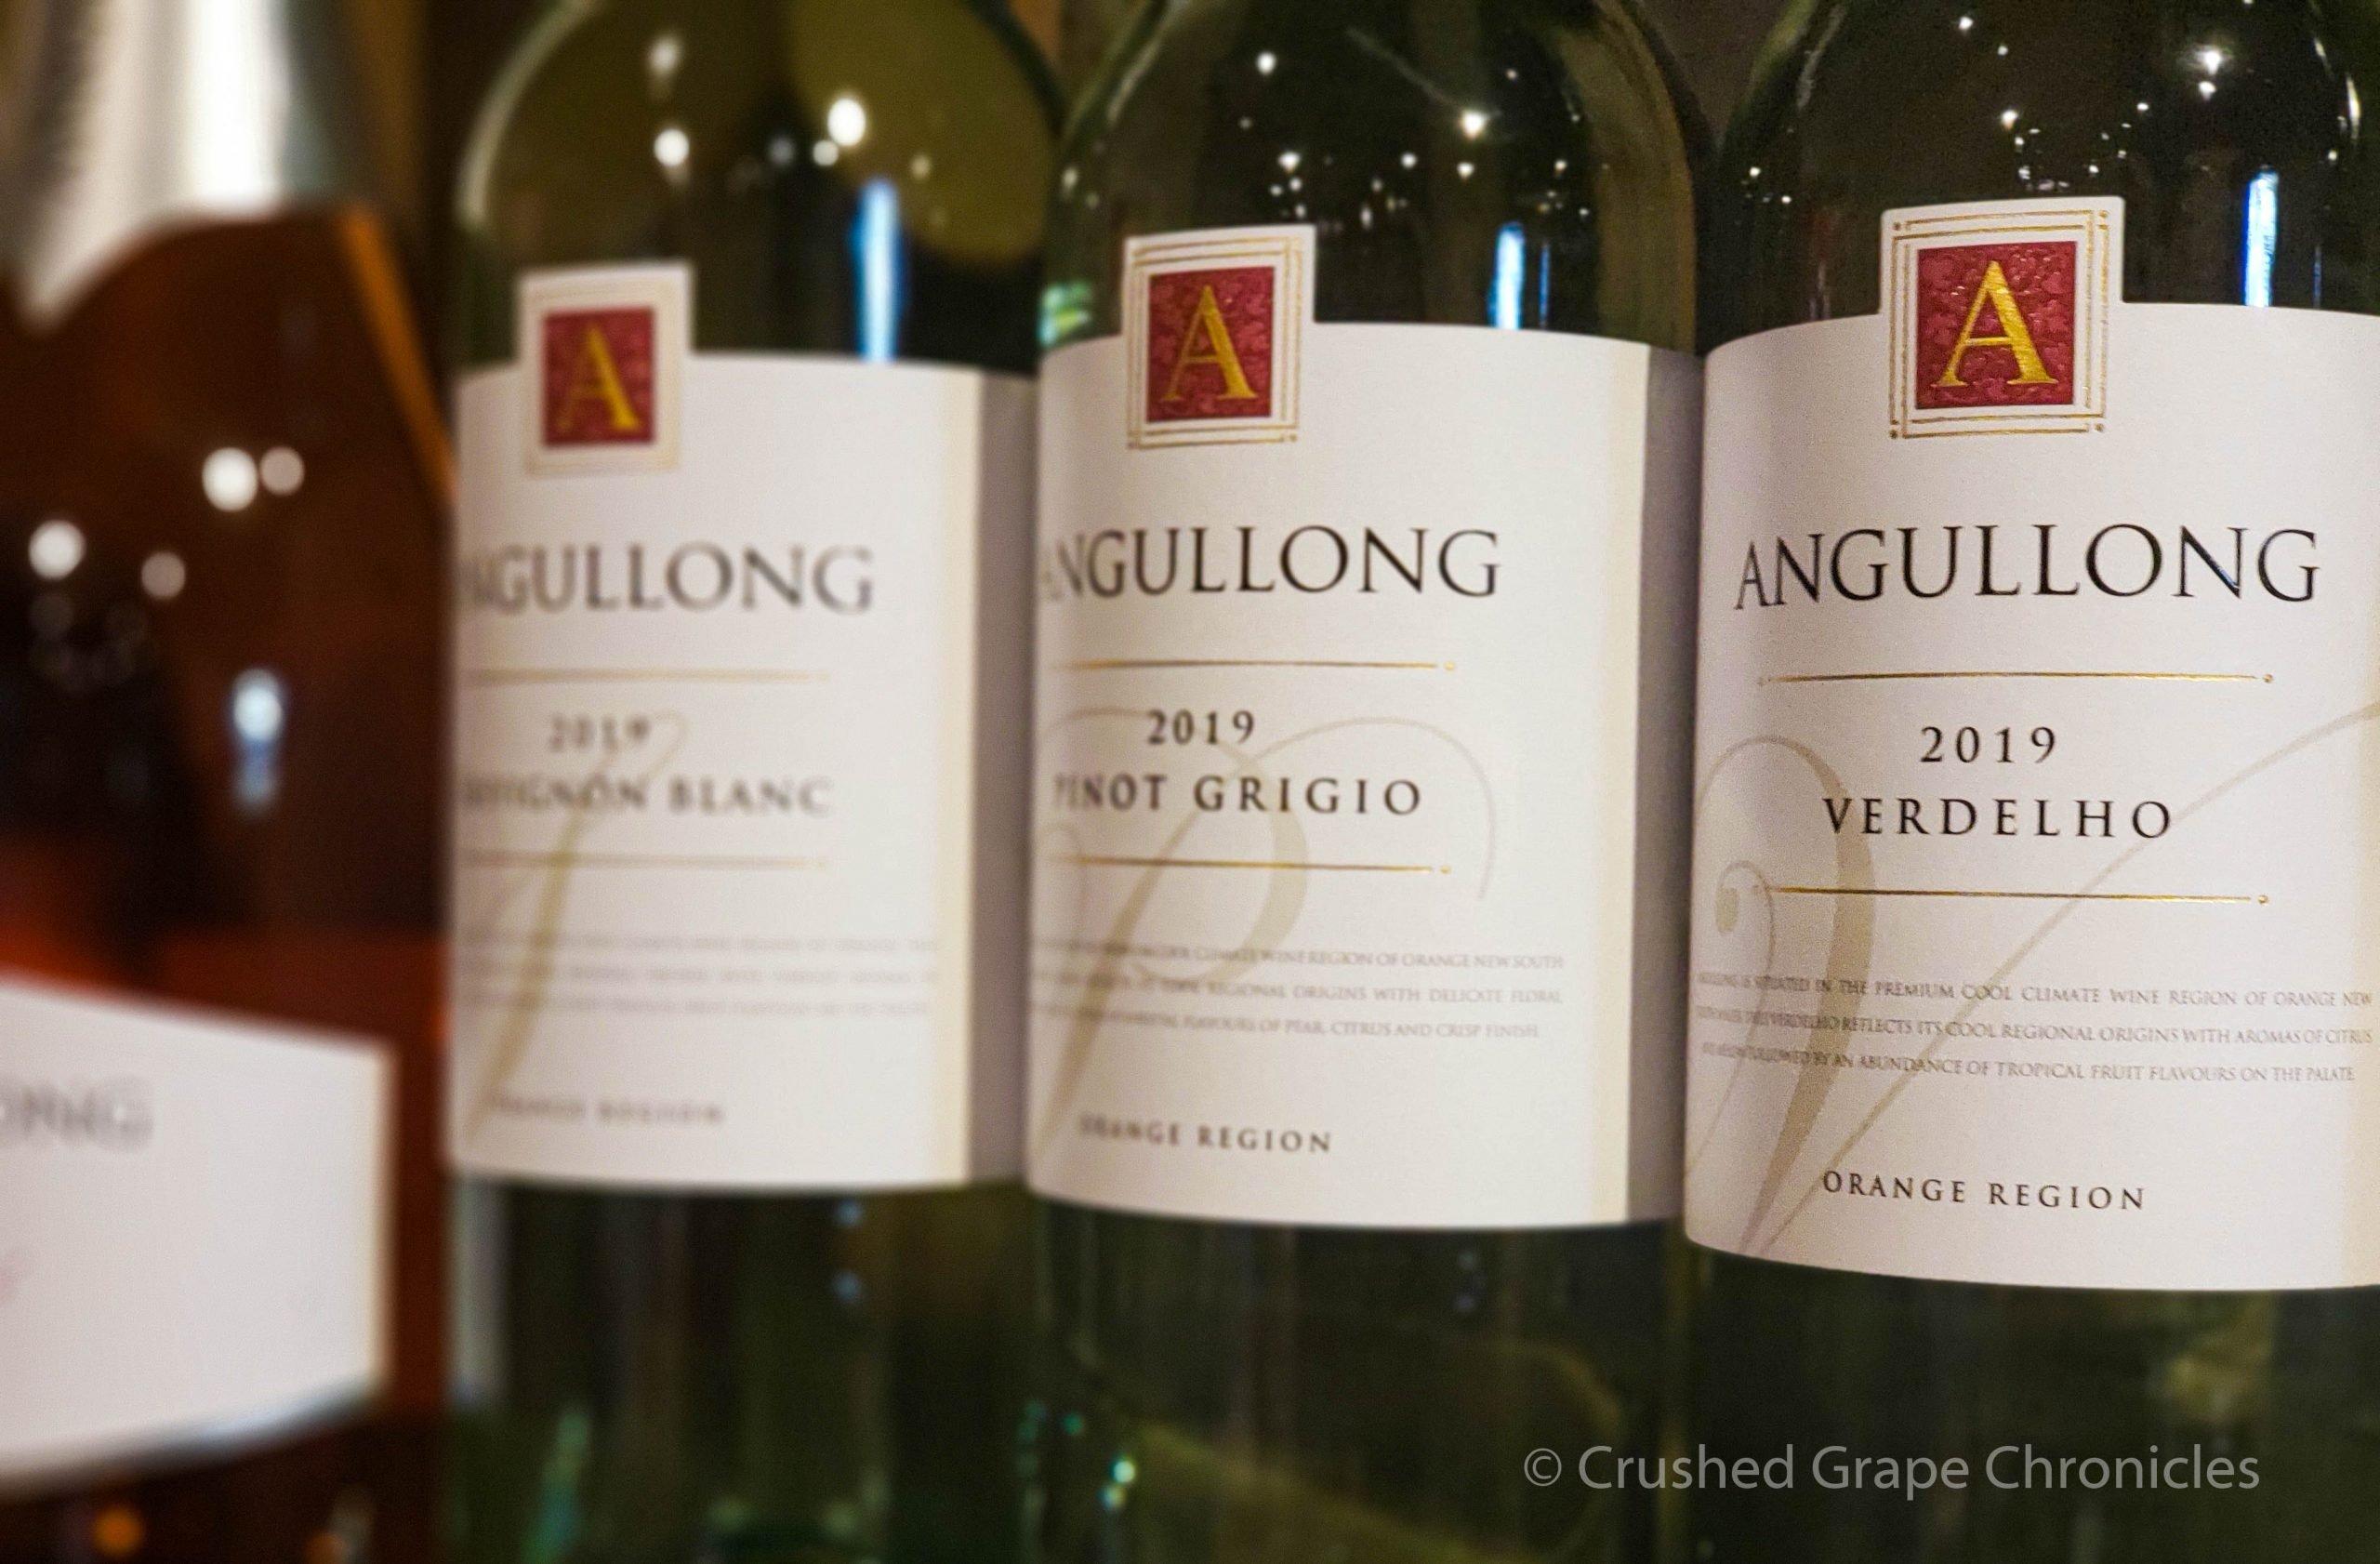 Angullong 2019 Verdelho and 2019 Pinot Grigio and 2019 Savignon Blanc at Angullong Vineyard in Cellar Door in Millthorpe, Orange NSW